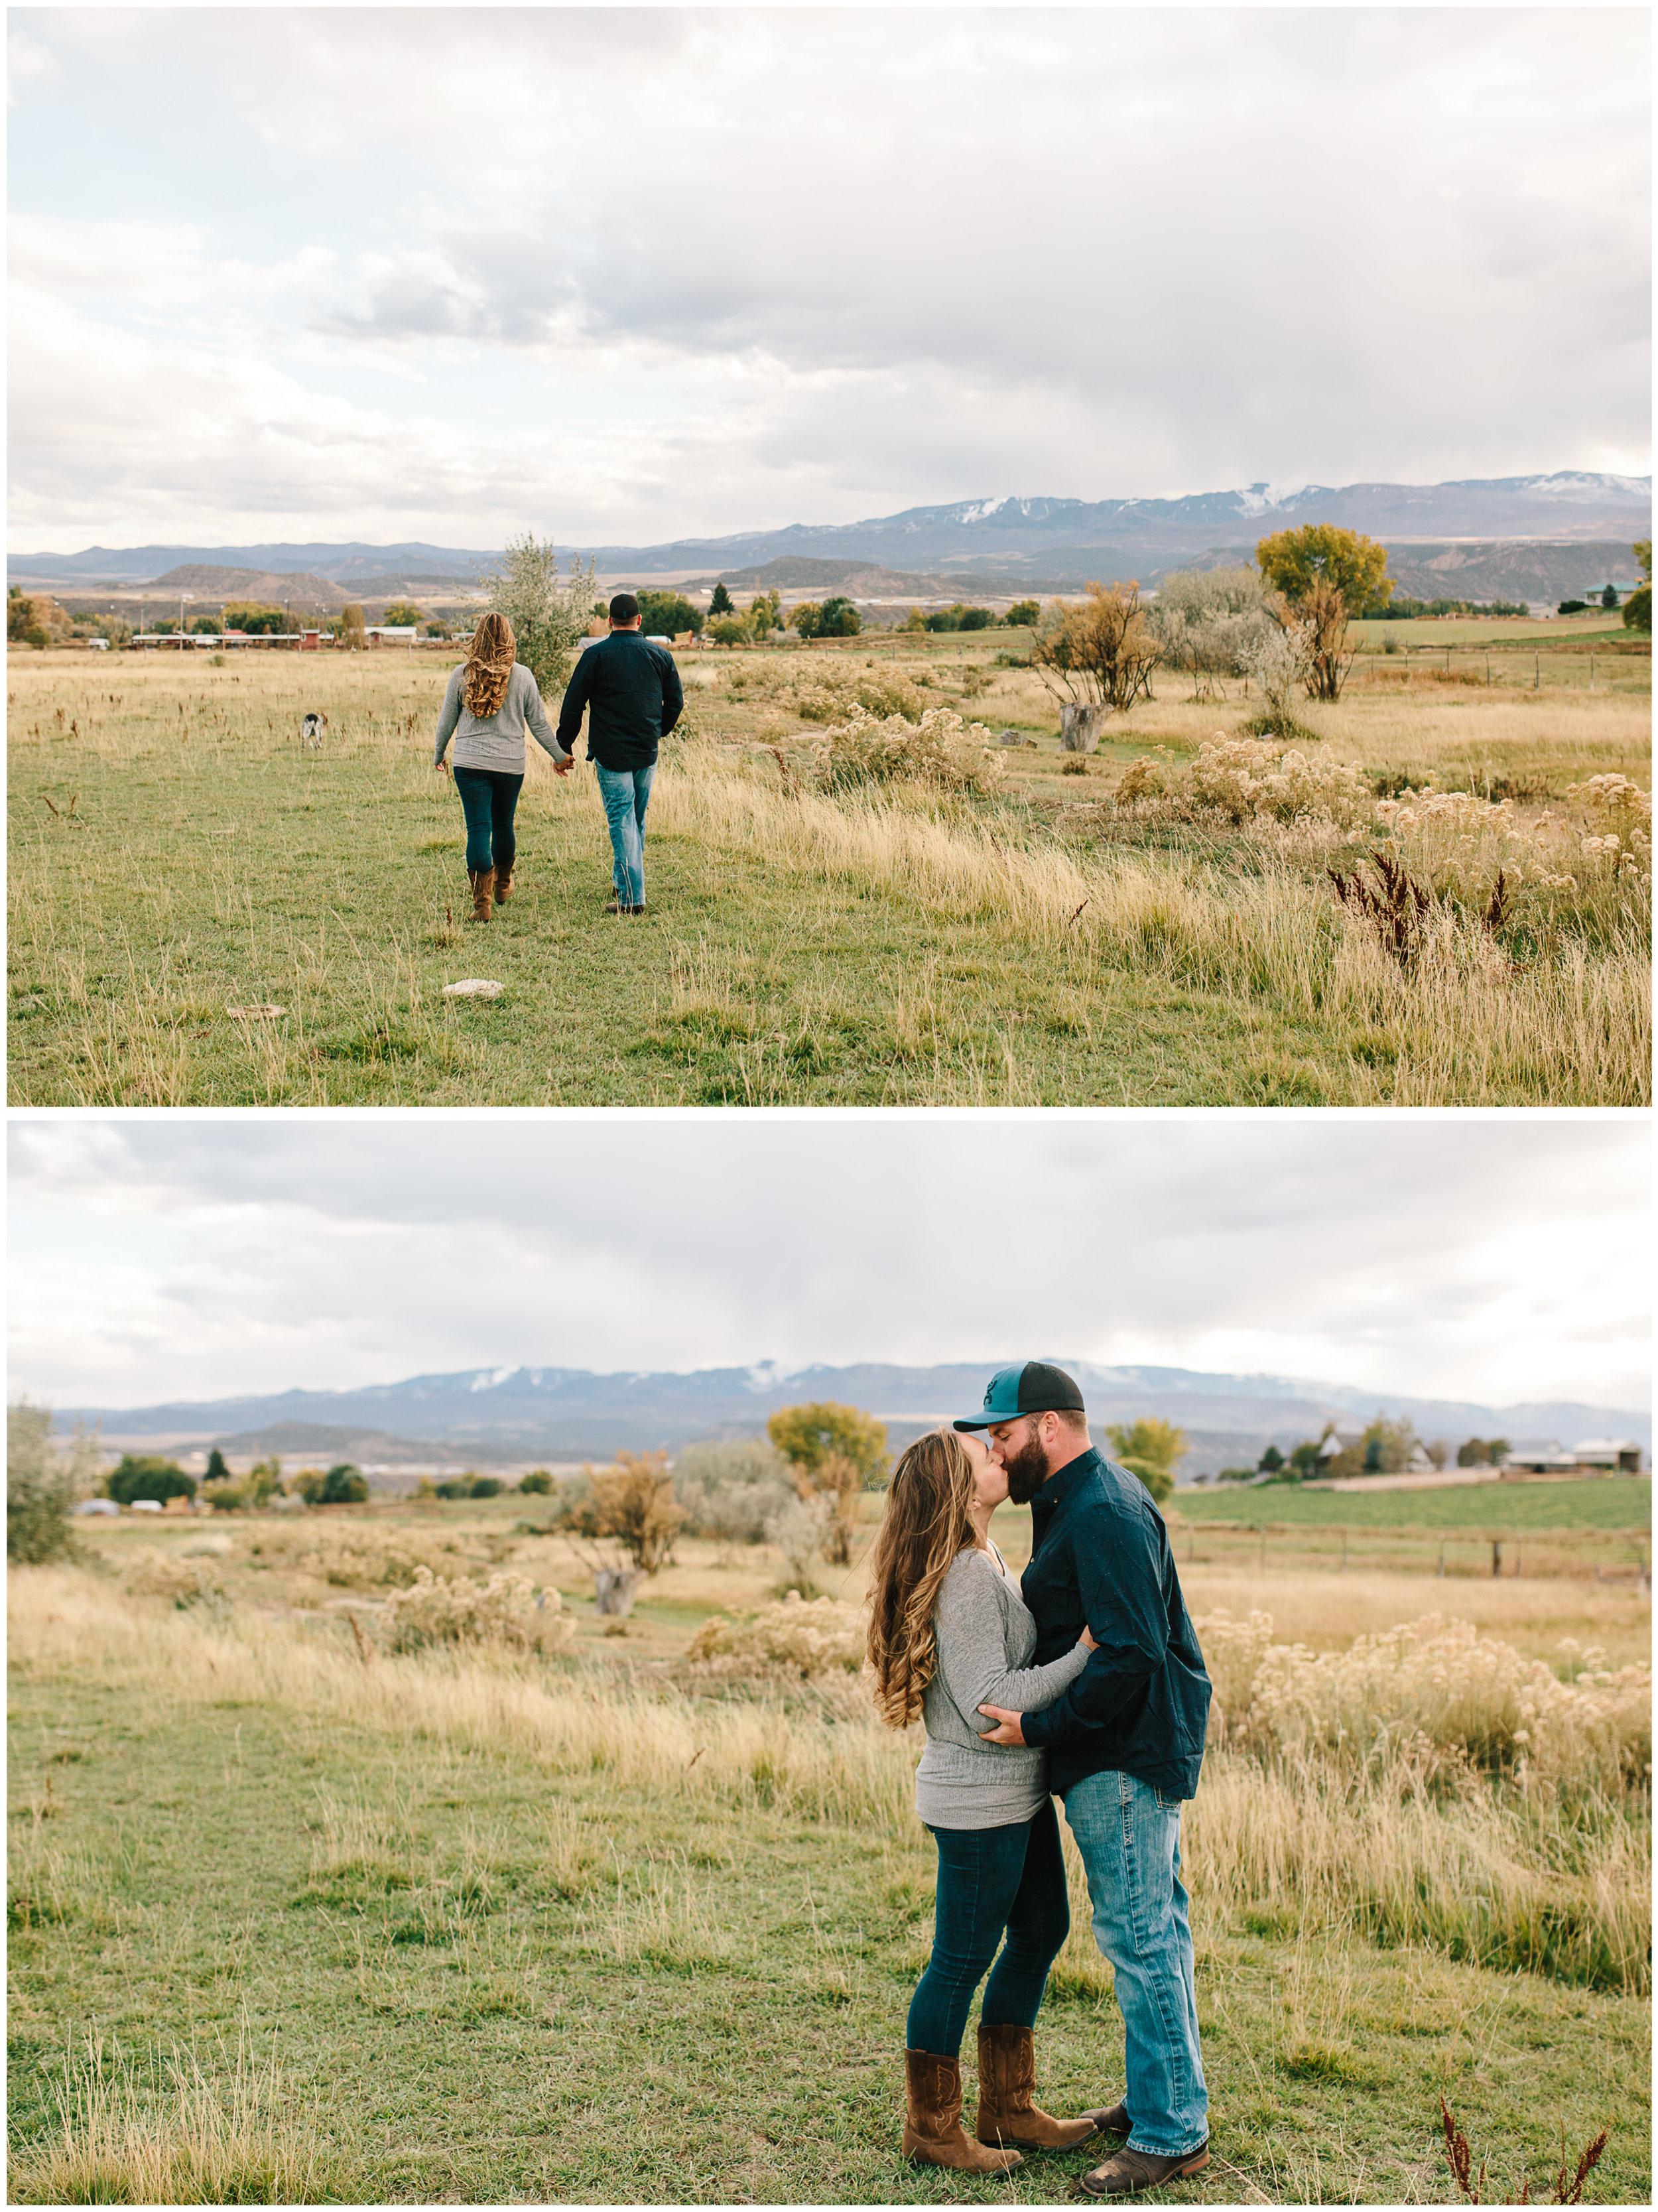 Tara_Robert_Engagement_8.jpg